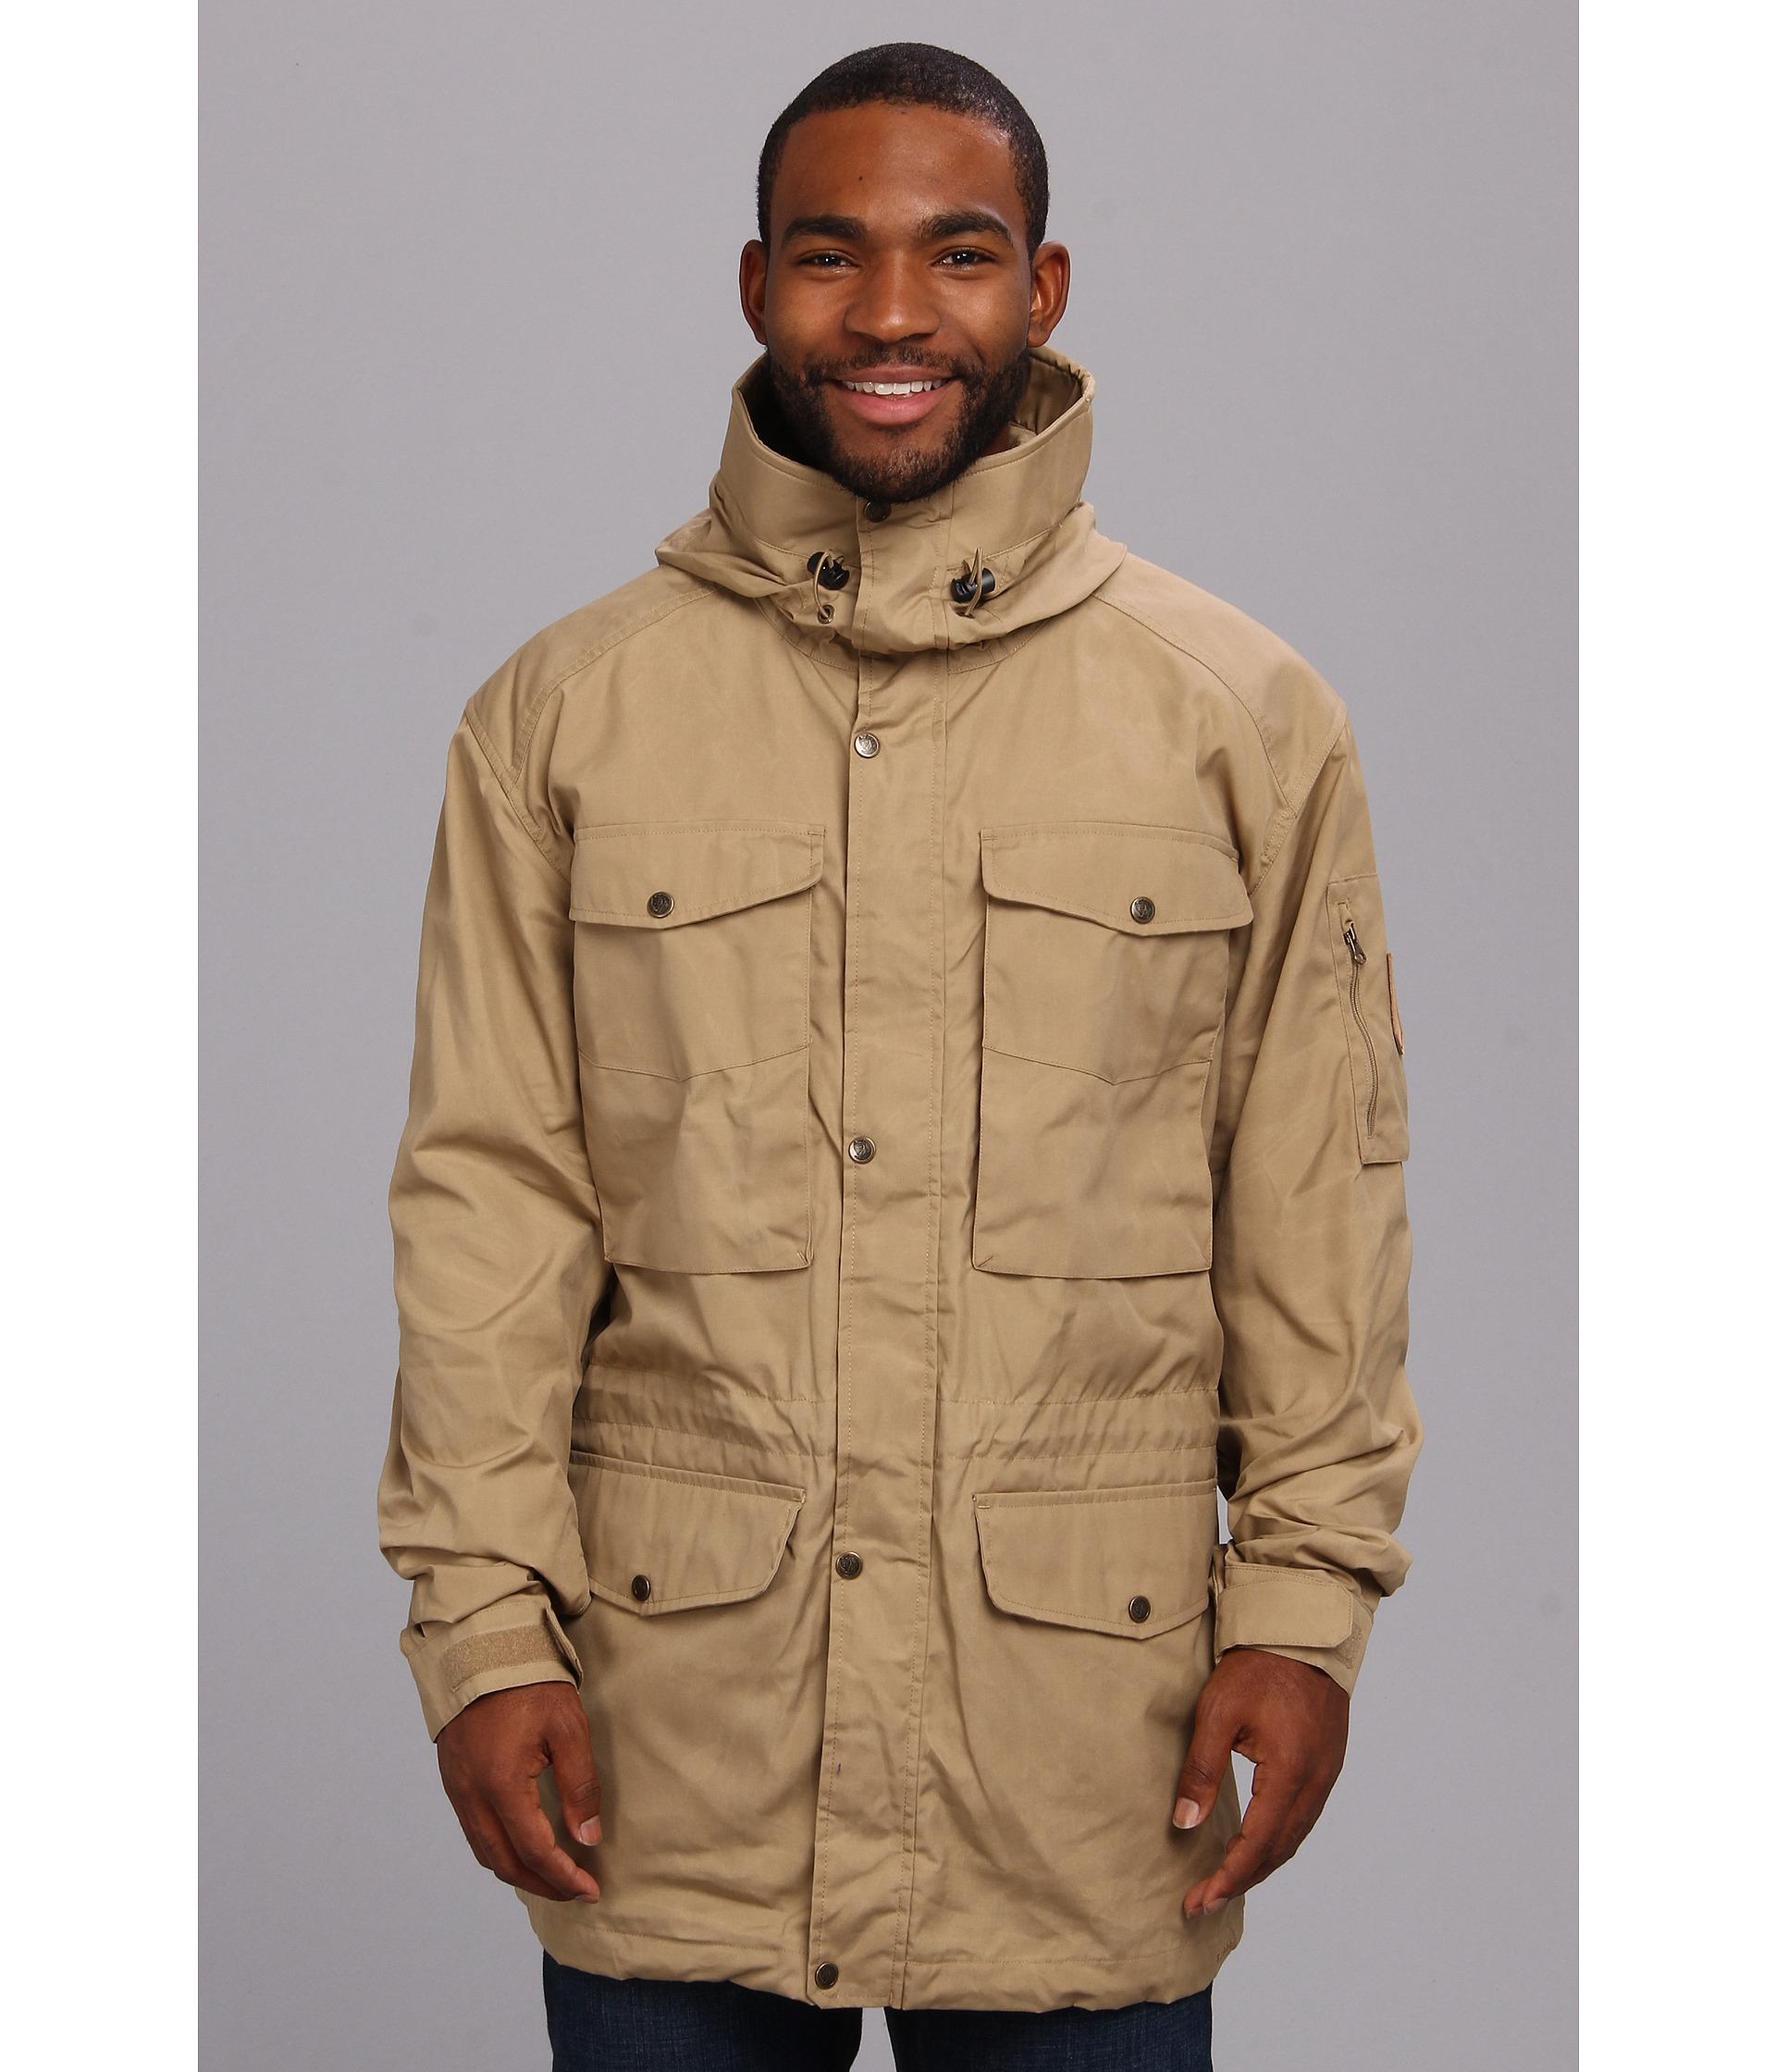 Lyst - Fjallraven Sarek Trekking Jacket in Natural for Men 0bd76e7e406bf